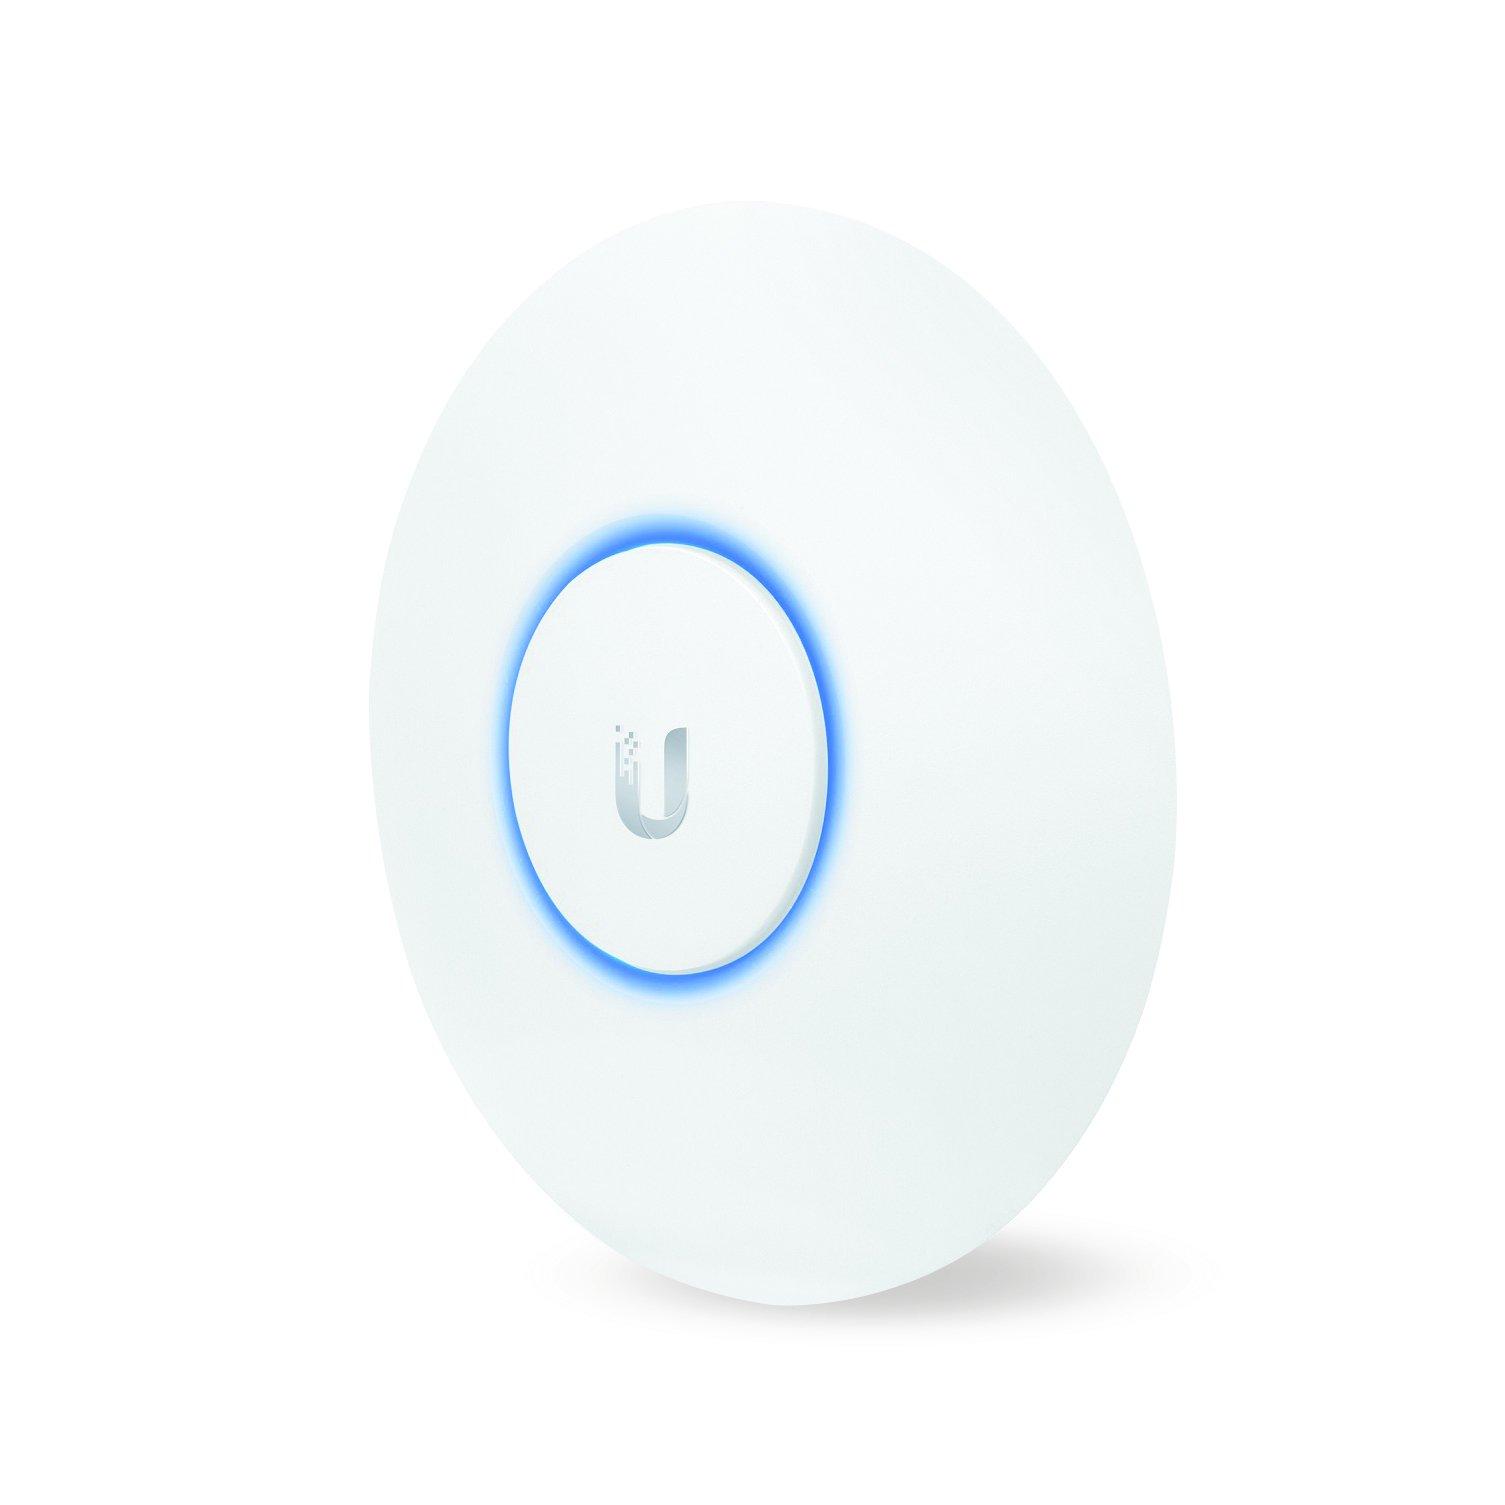 Ubiquiti UAP-AC-LITE UniFi AP AC LITE 802.11ac Gigabit Dual-Radio PoE by Ubiquiti Networks